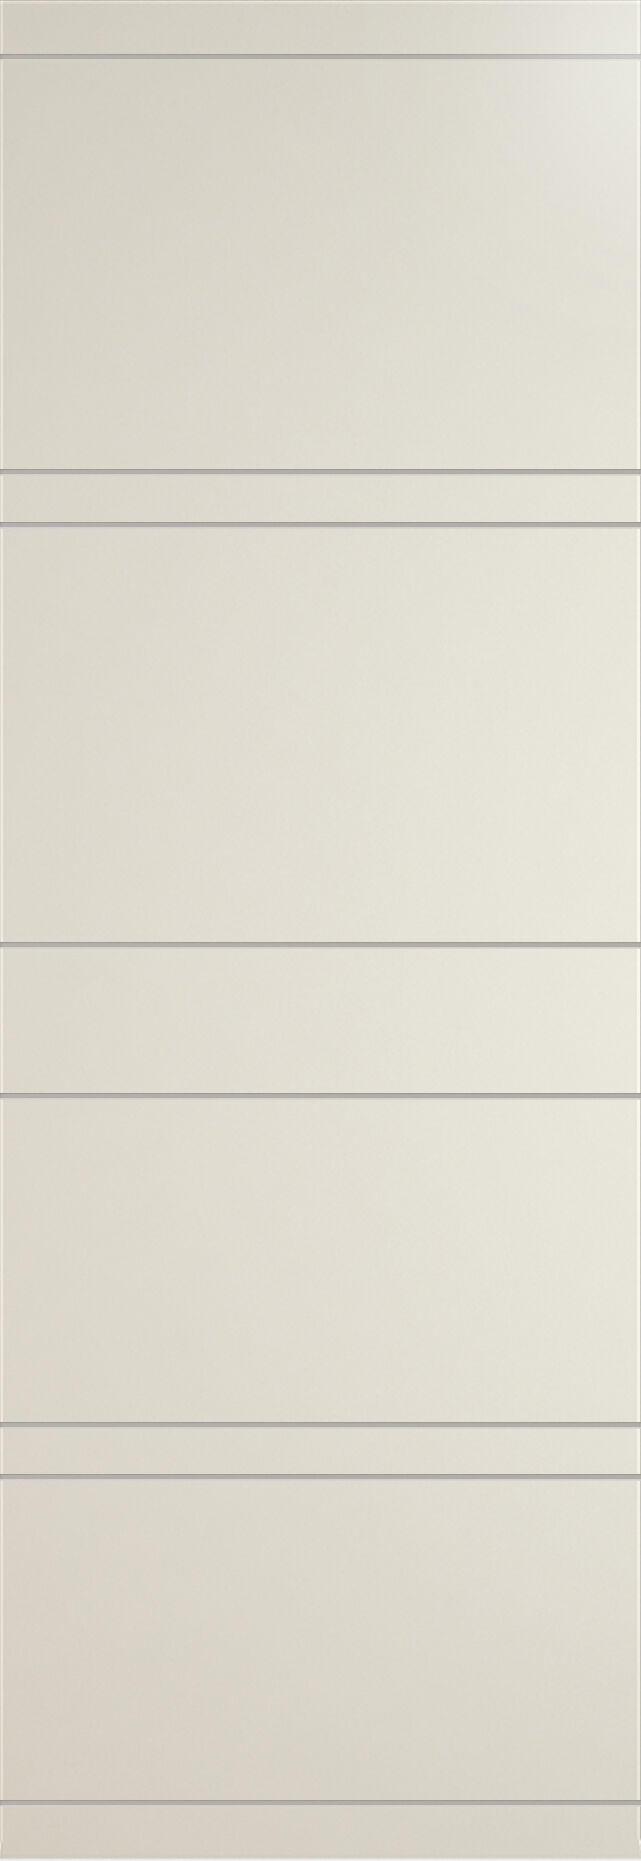 Tivoli Е-2 Invisible цвет - Жемчужная эмаль Без стекла (ДГ)